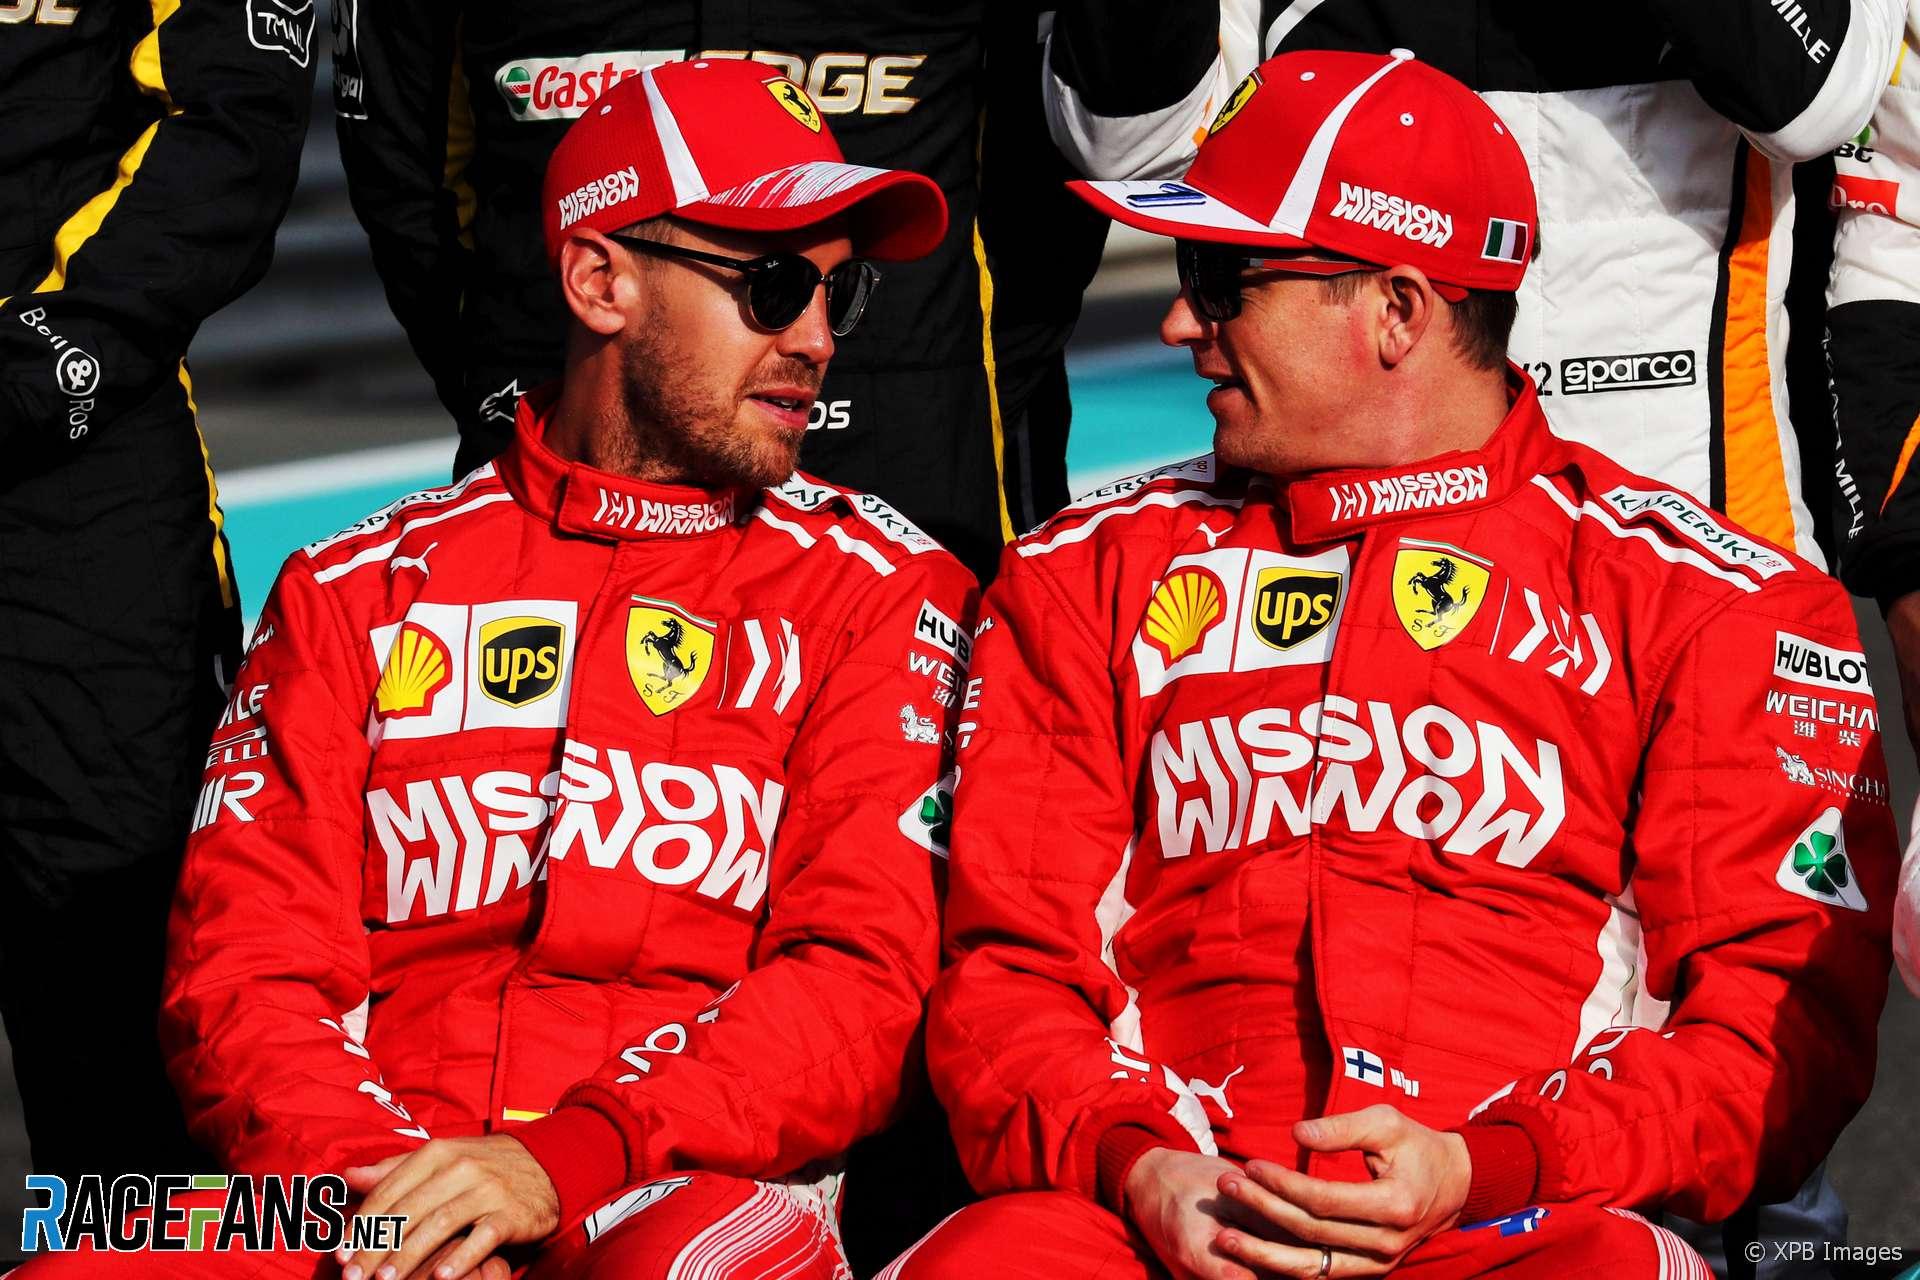 Sebastian Vettel, Kimi Raikkonen, Yas Marina, 2018